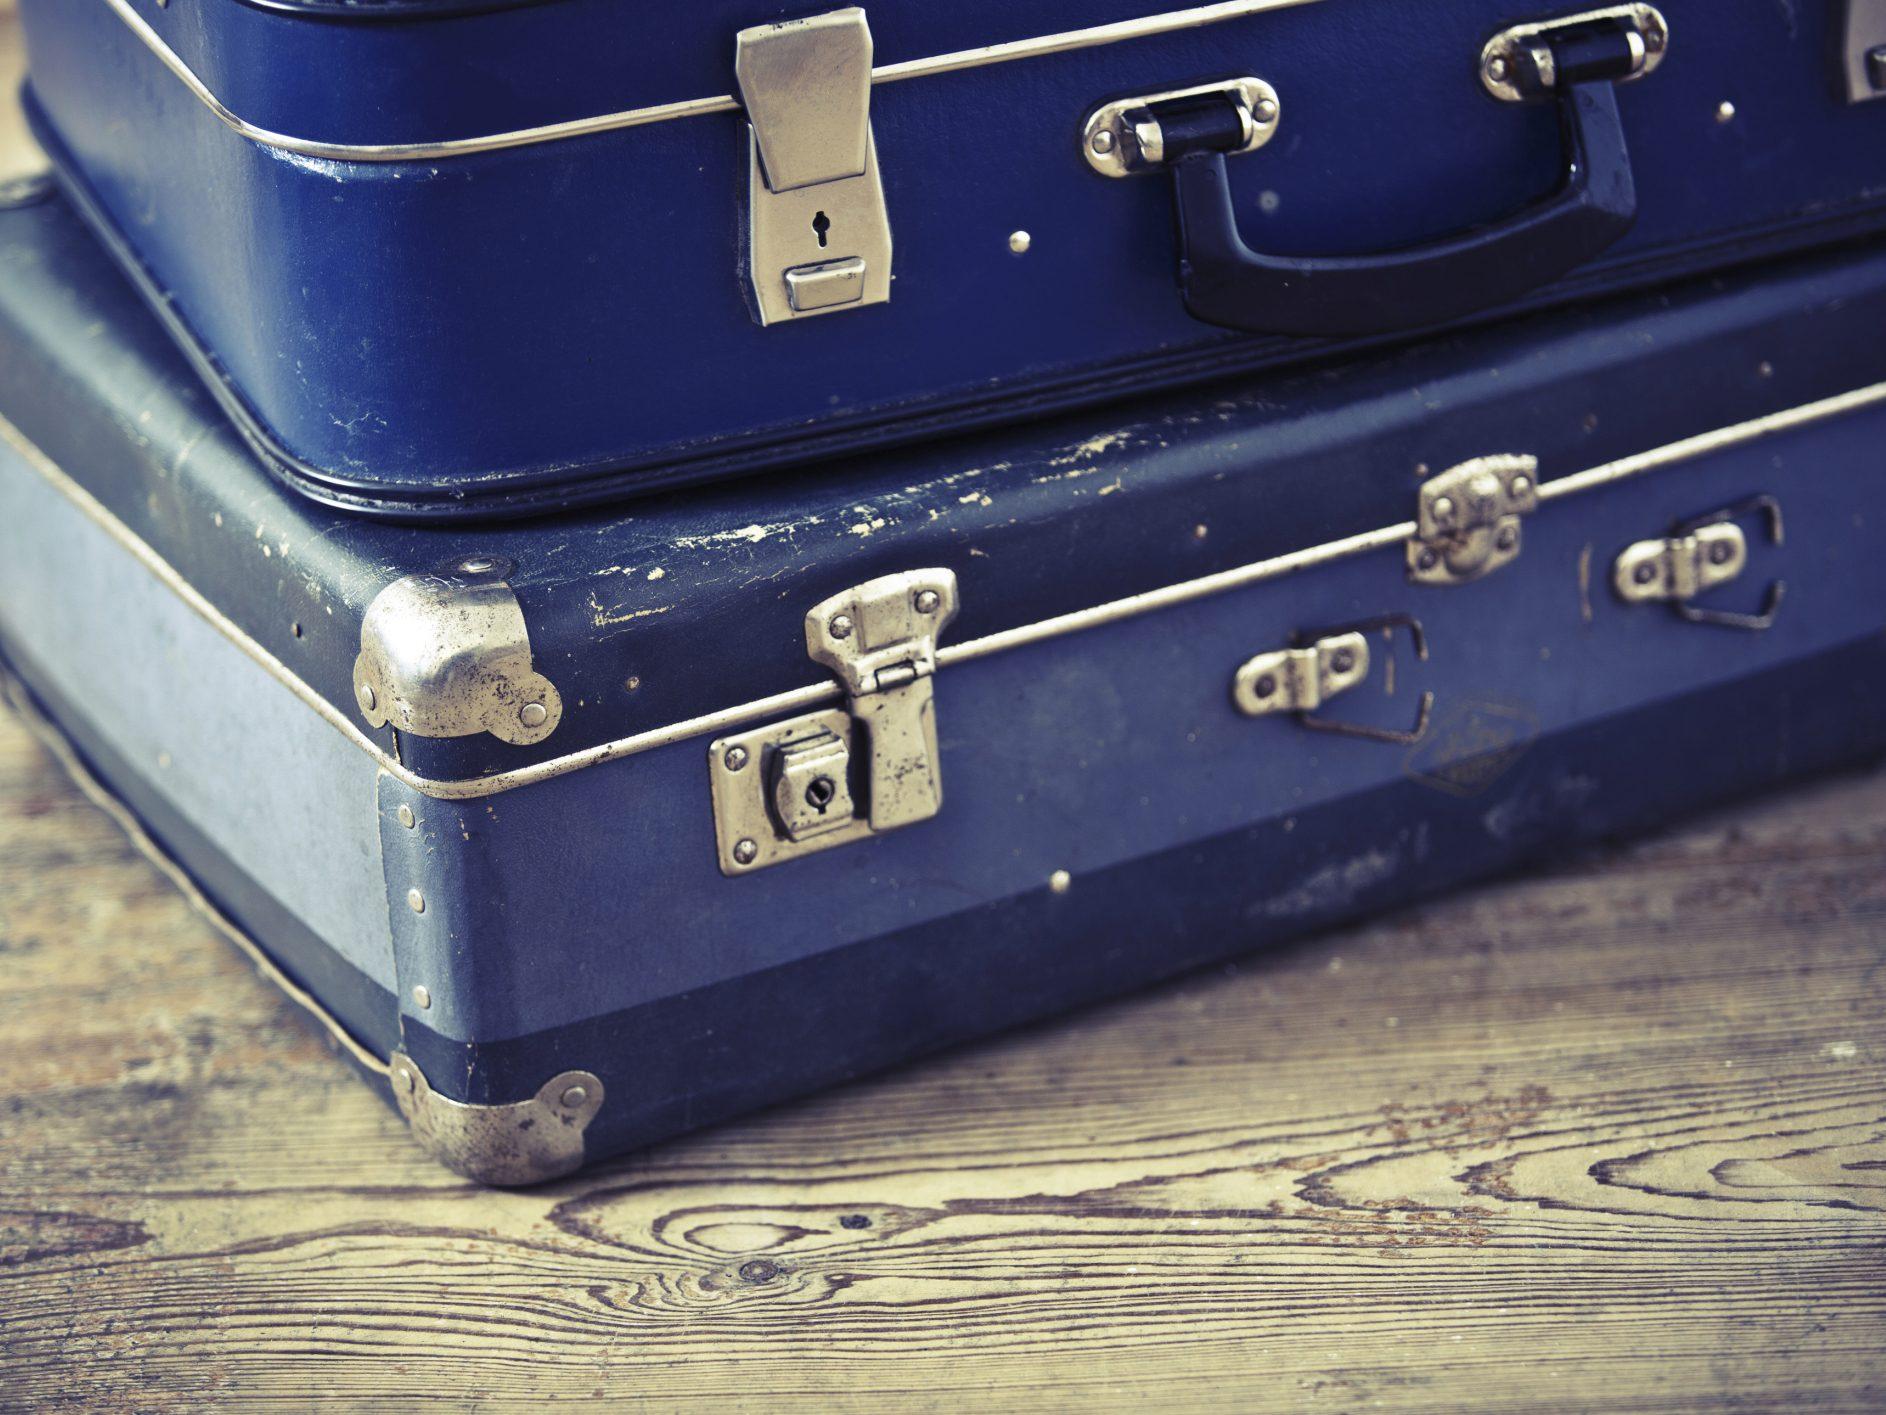 Less Luggage